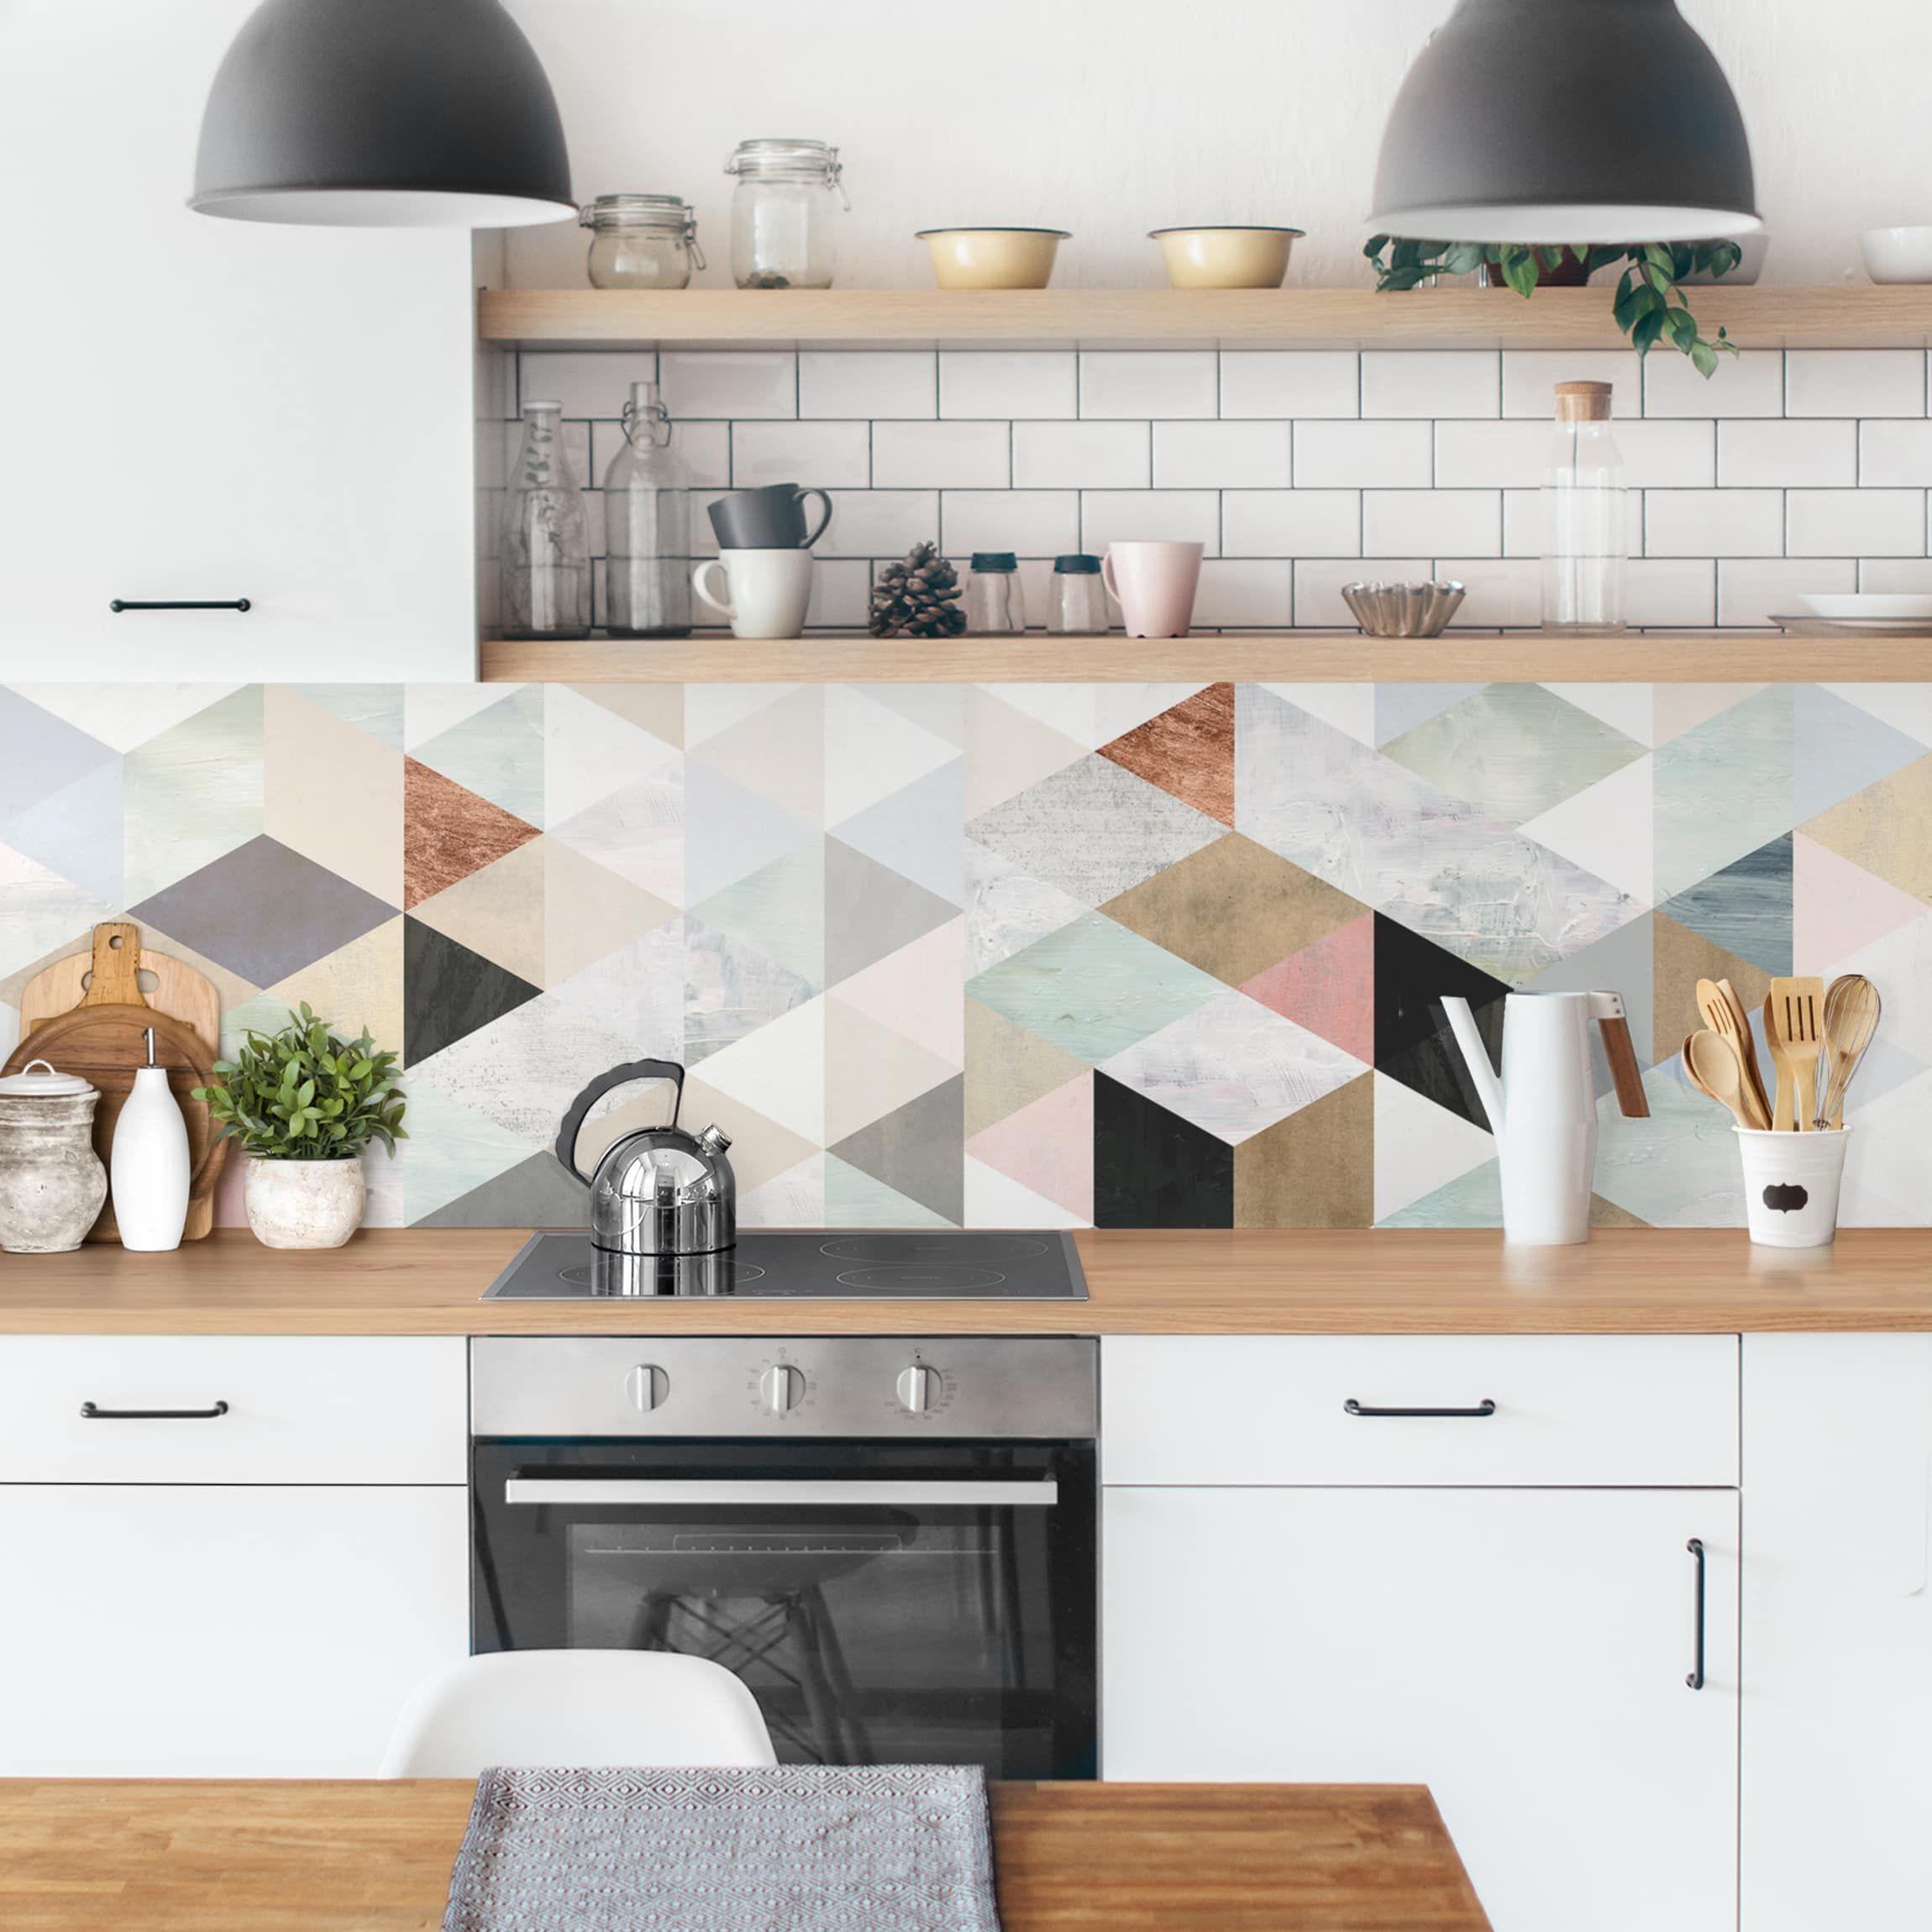 Küchenrückwand - Aquarell-Mosaik mit Dreiecken I in 2020 ...